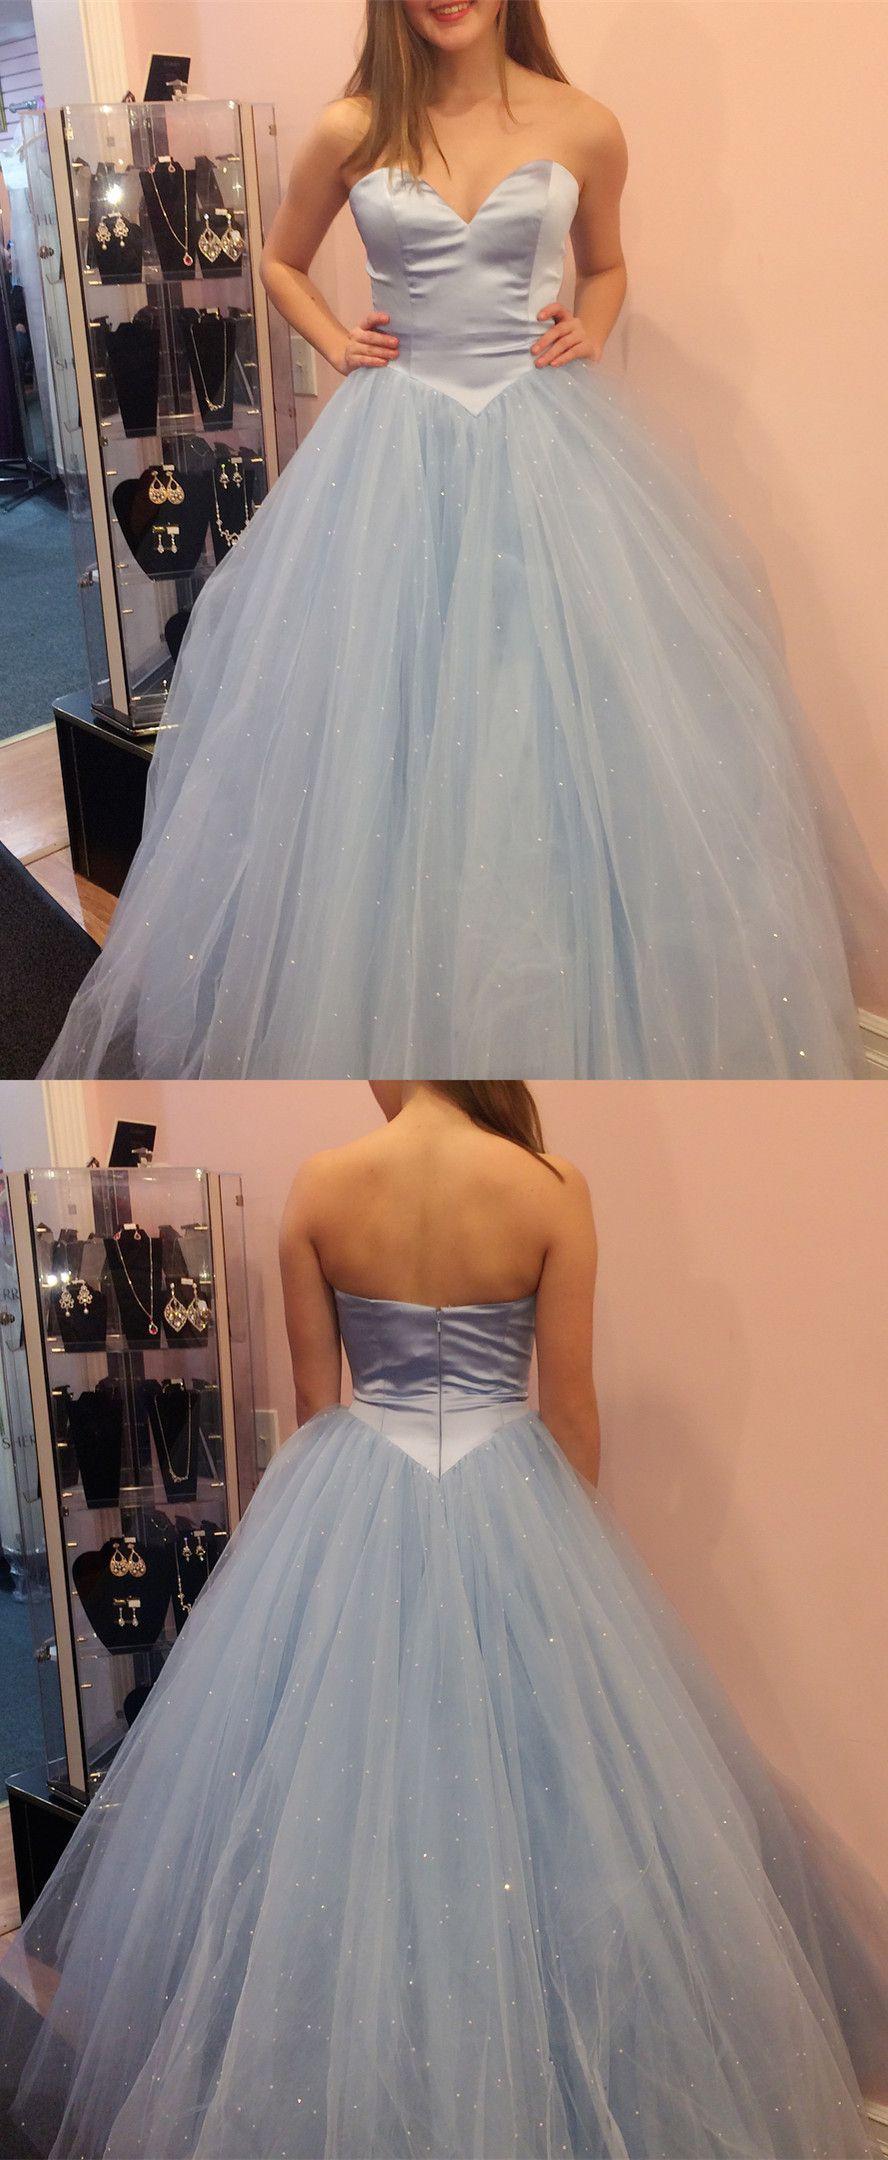 Princess sweetheart bluepink long ball gown formal dresses